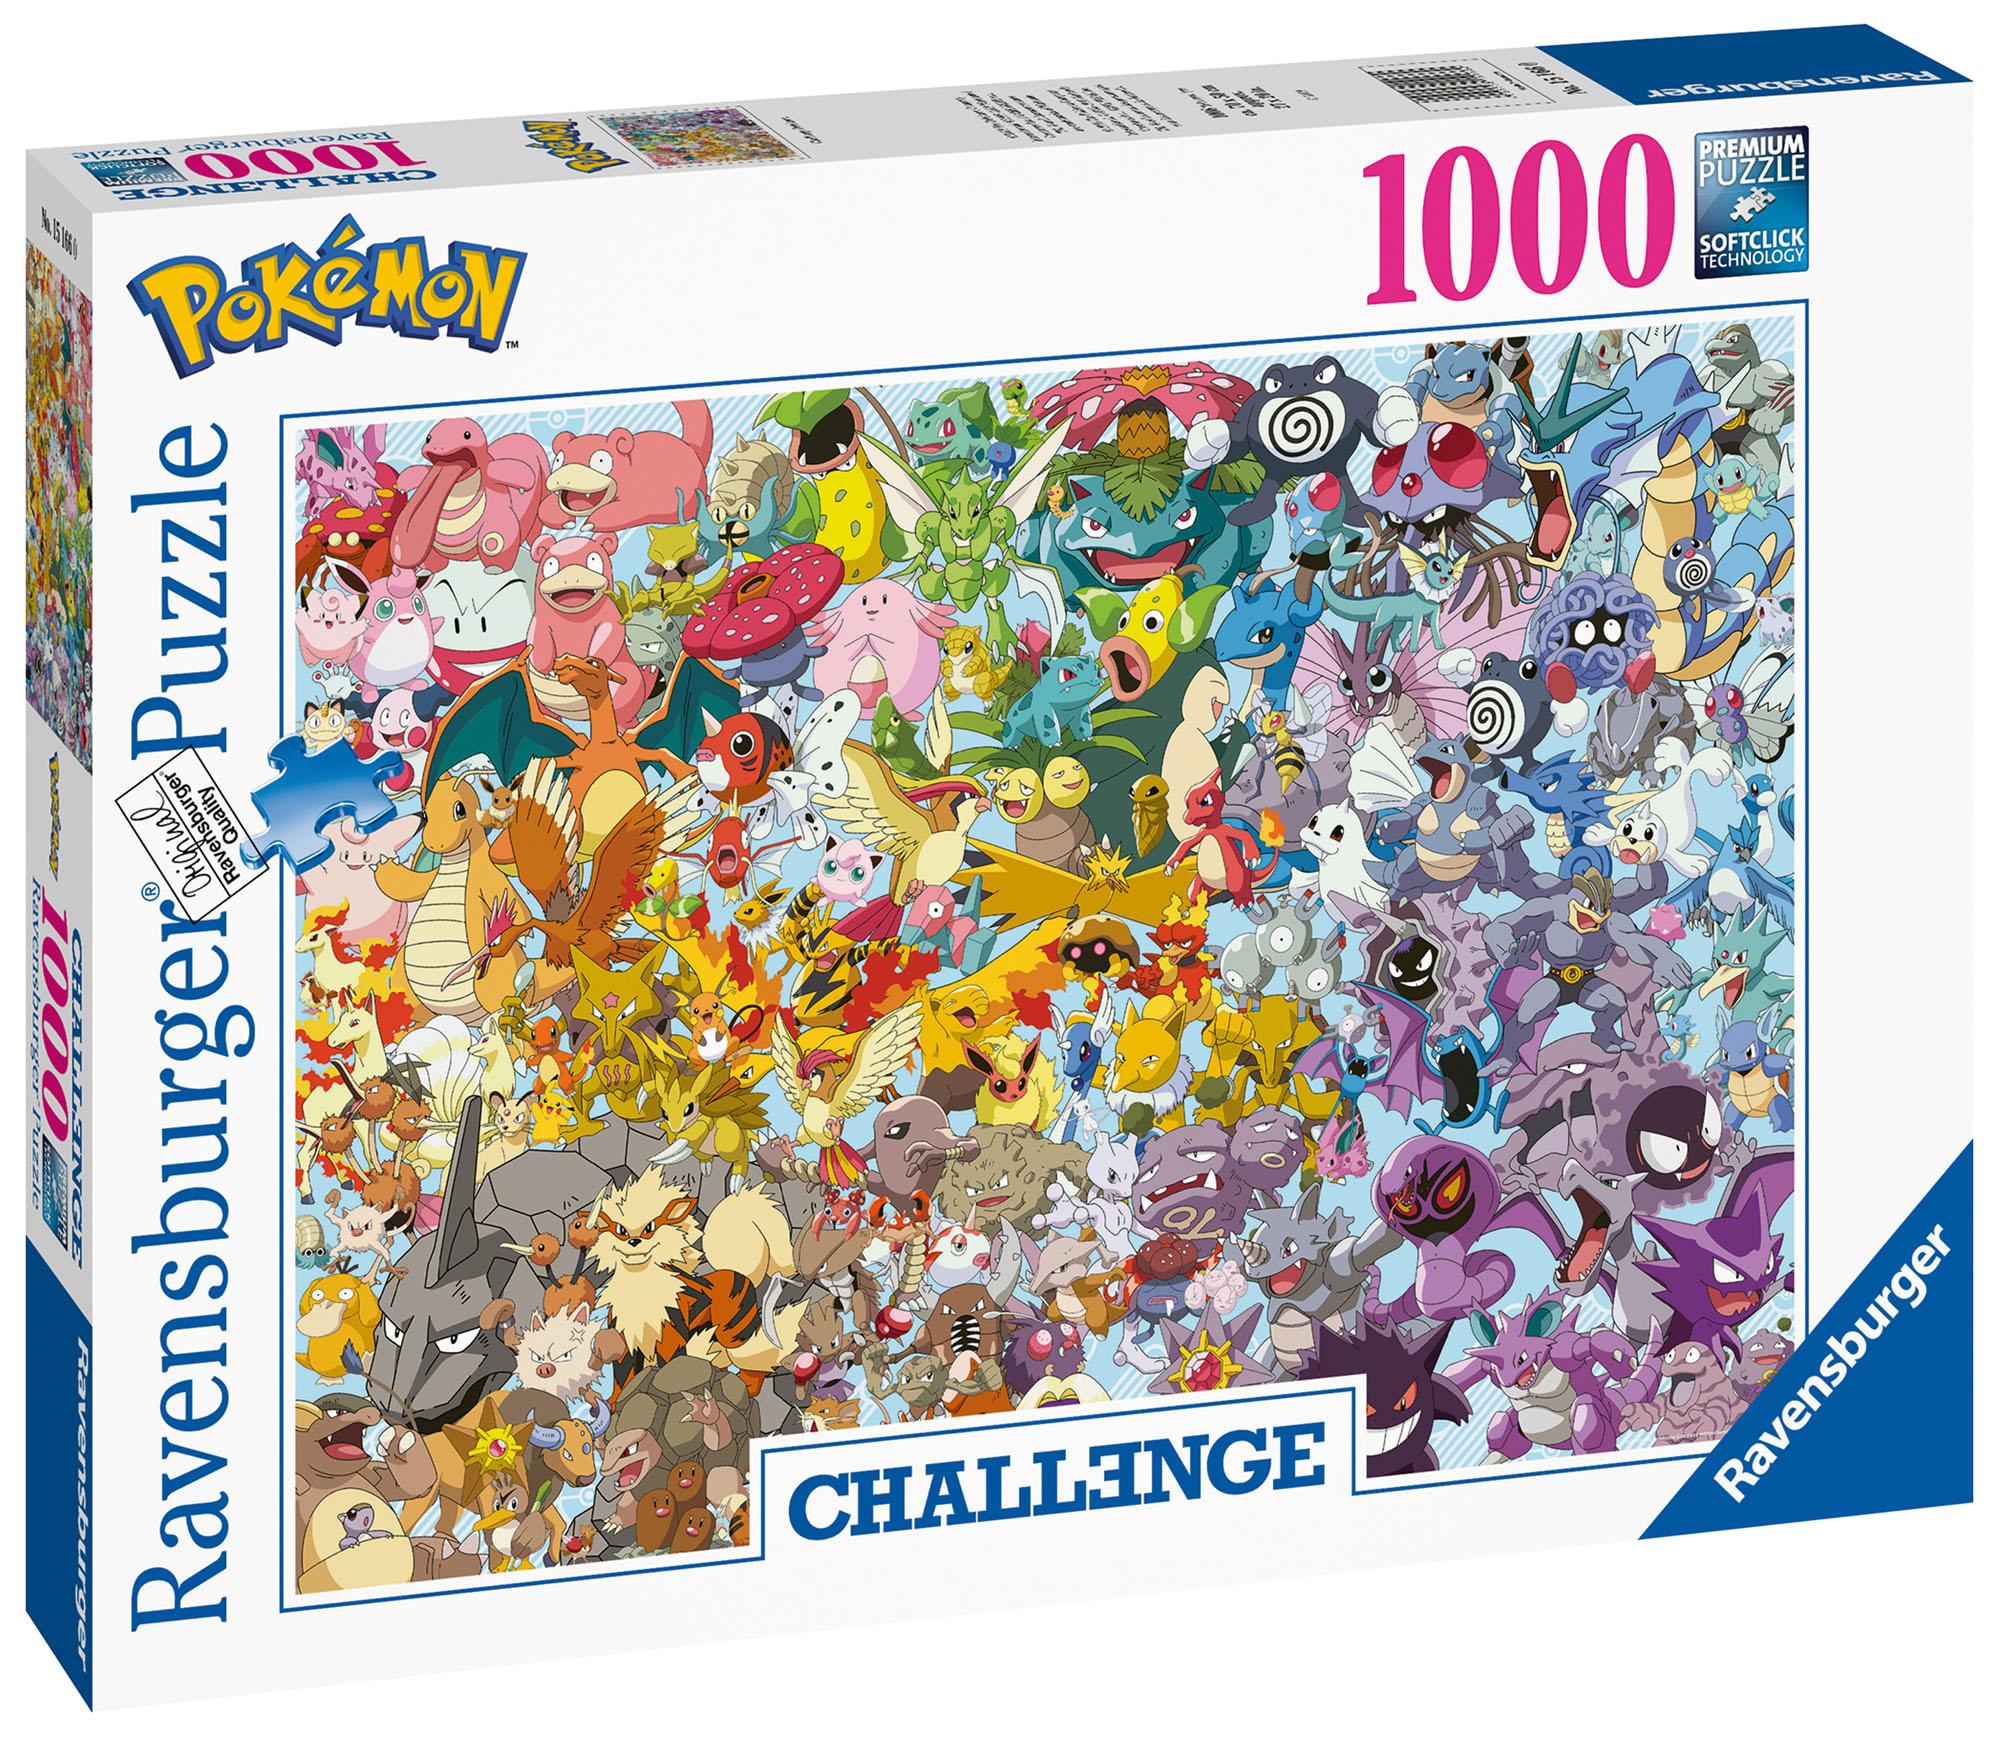 Image result for pokemon 1000 jigsaw